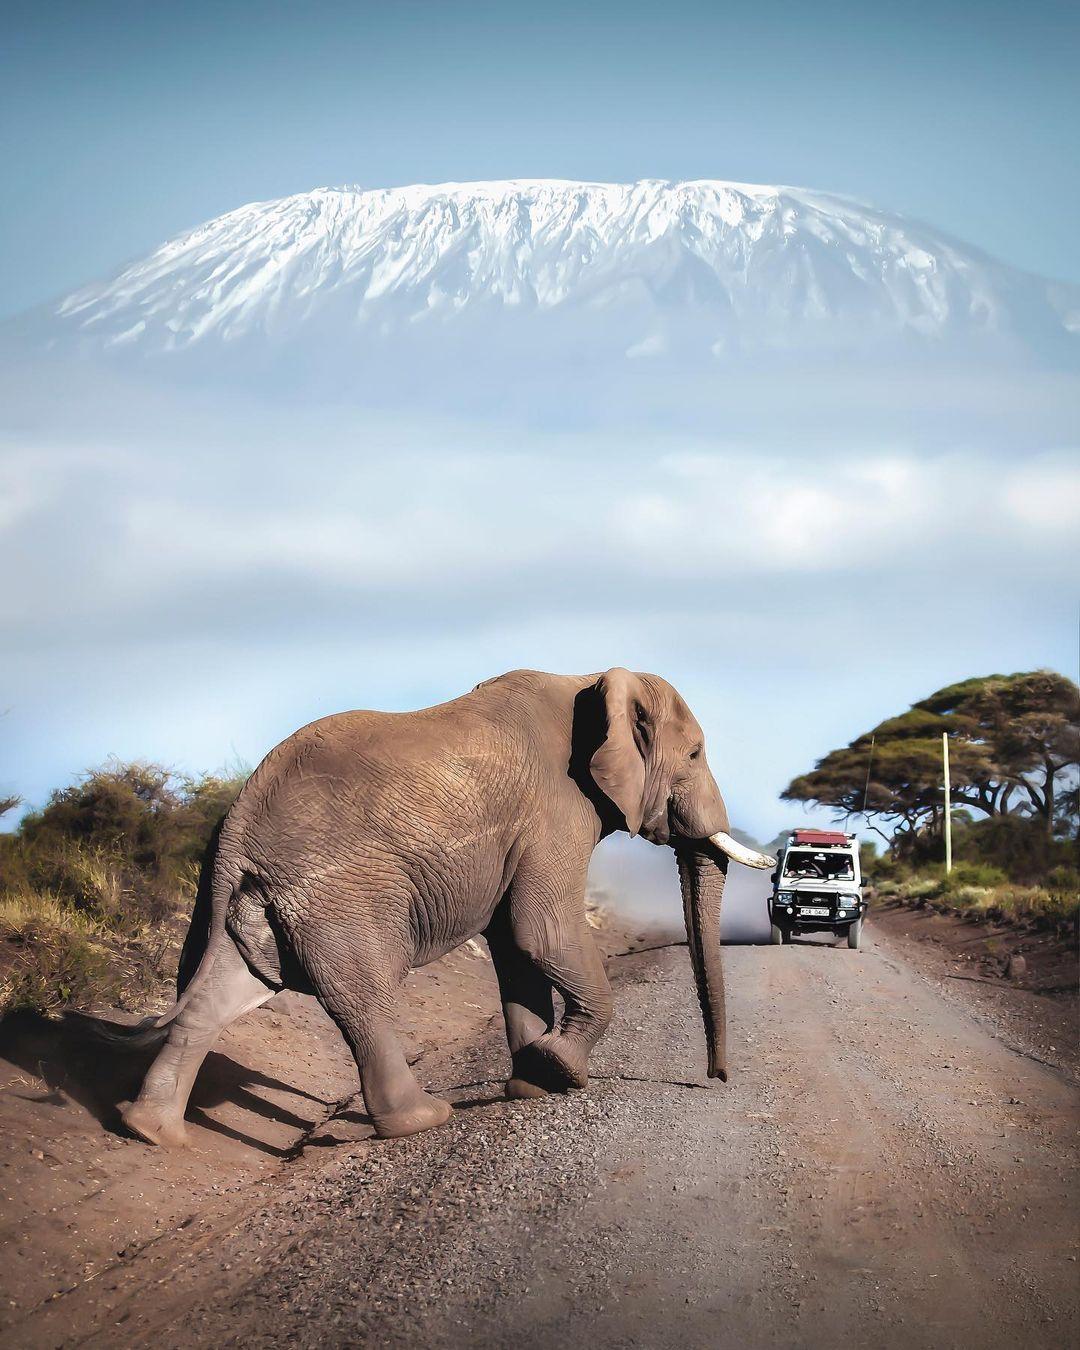 kenya hottest destinations in africa